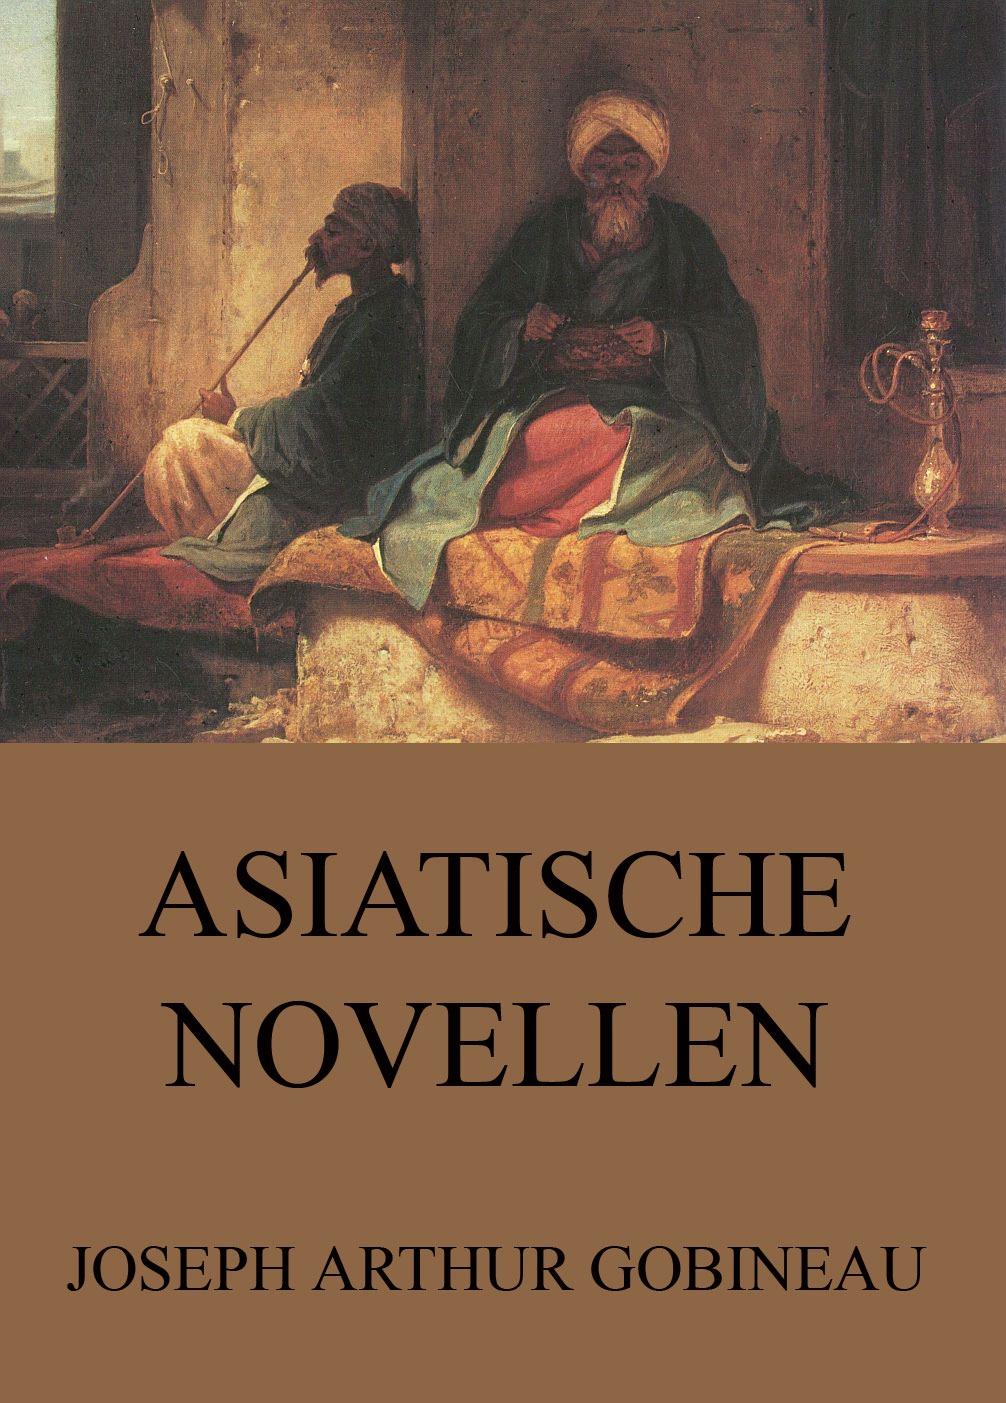 Asiatische Novellen ( Joseph Arthur  Gobineau  )